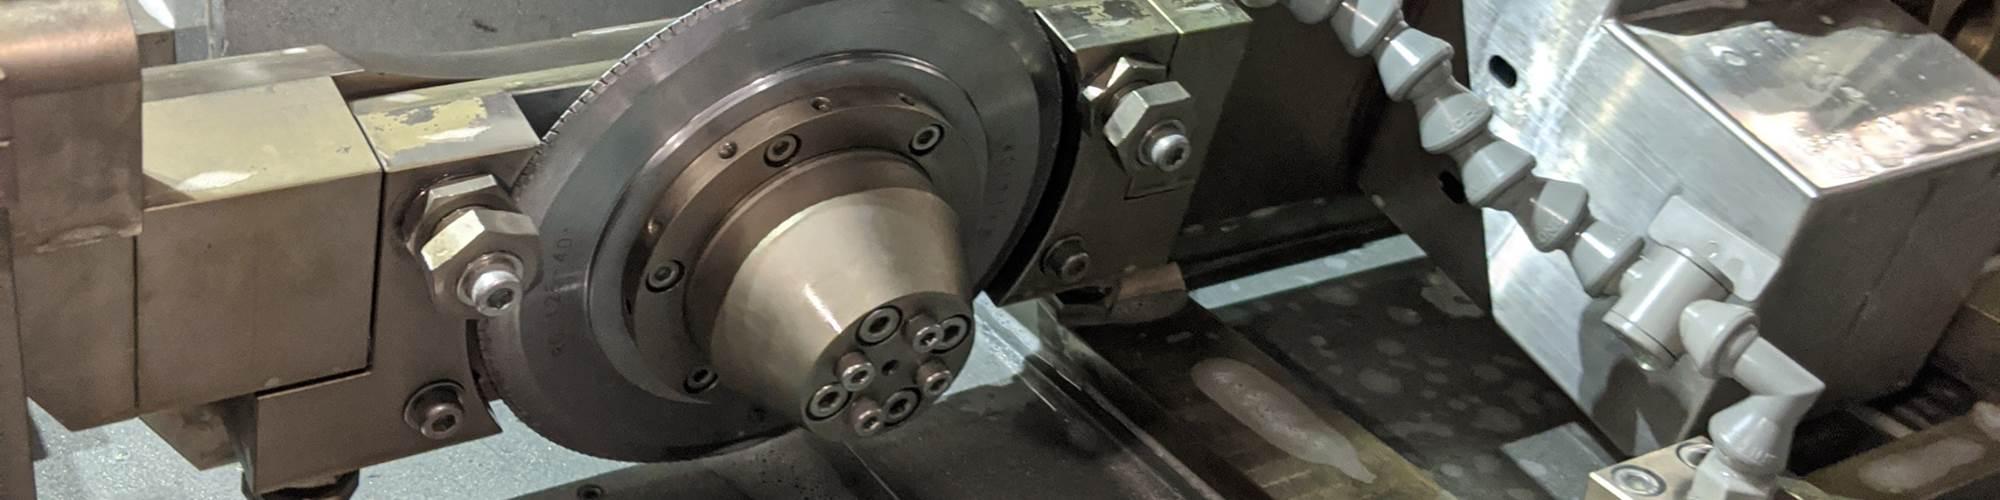 Amada grinding machine with a CNC trunnion dresser